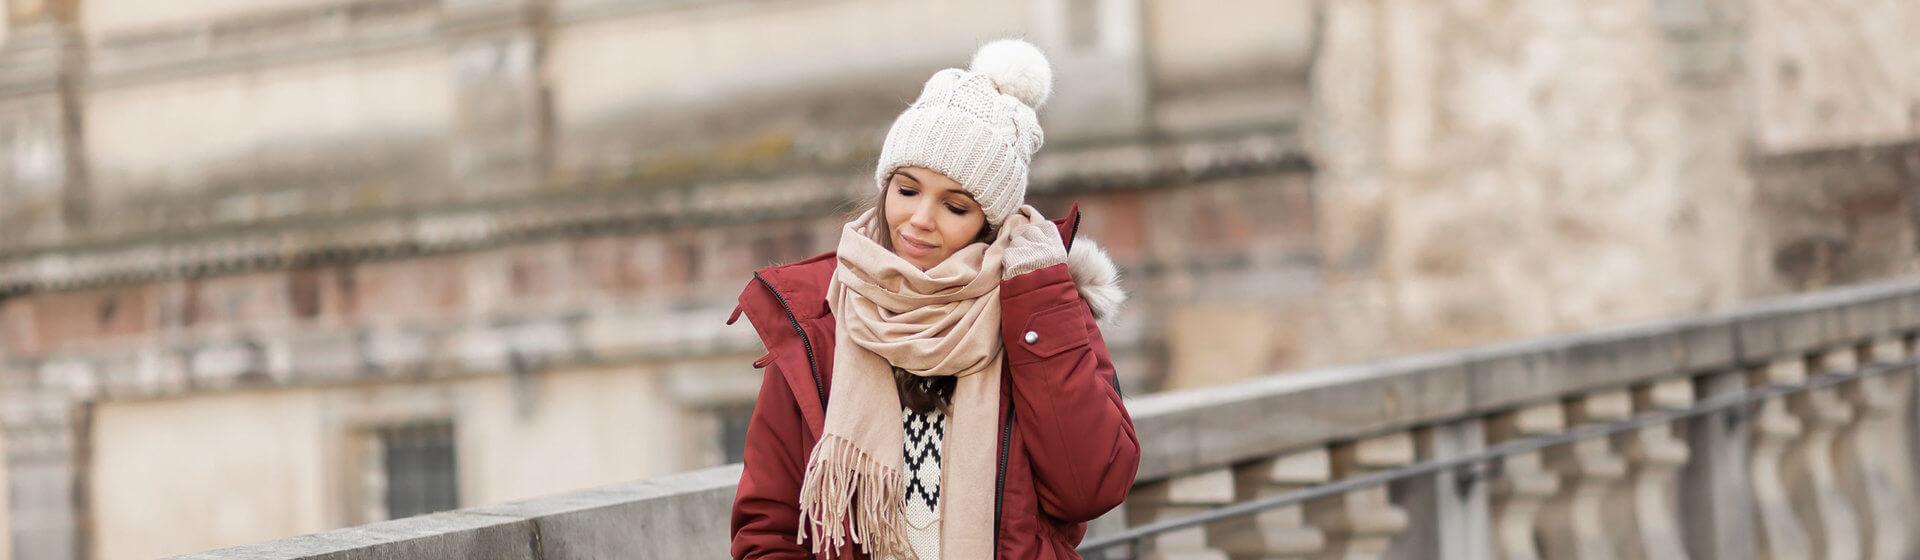 Winter Accessoires Trends, Shoelove by Deichmann